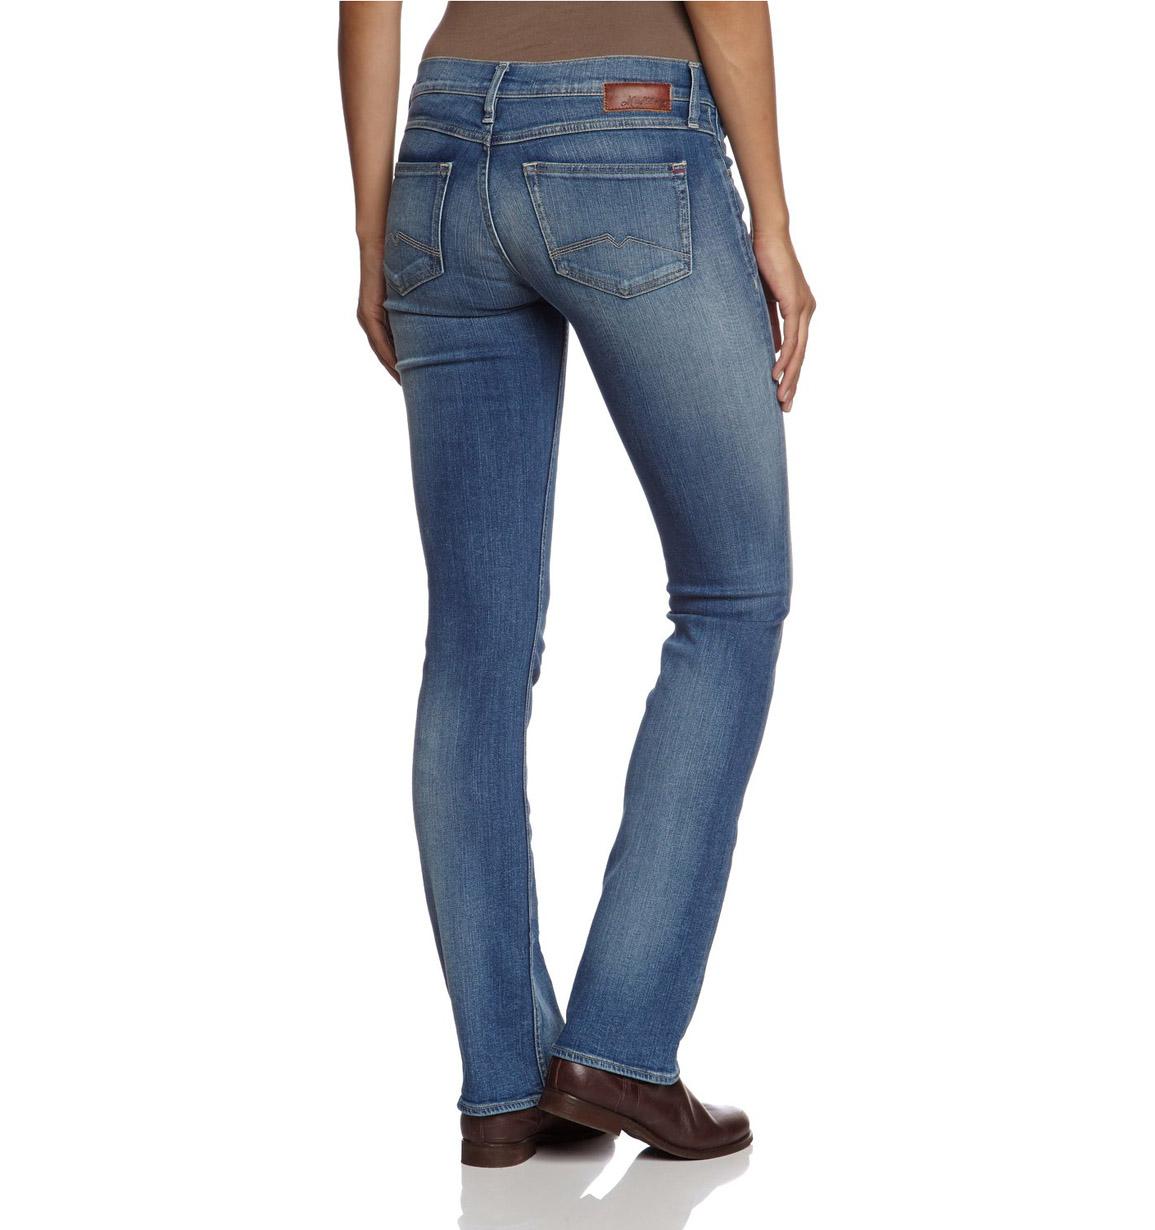 MUSTANG Damen Regular Fit Girls Oregon Jeans